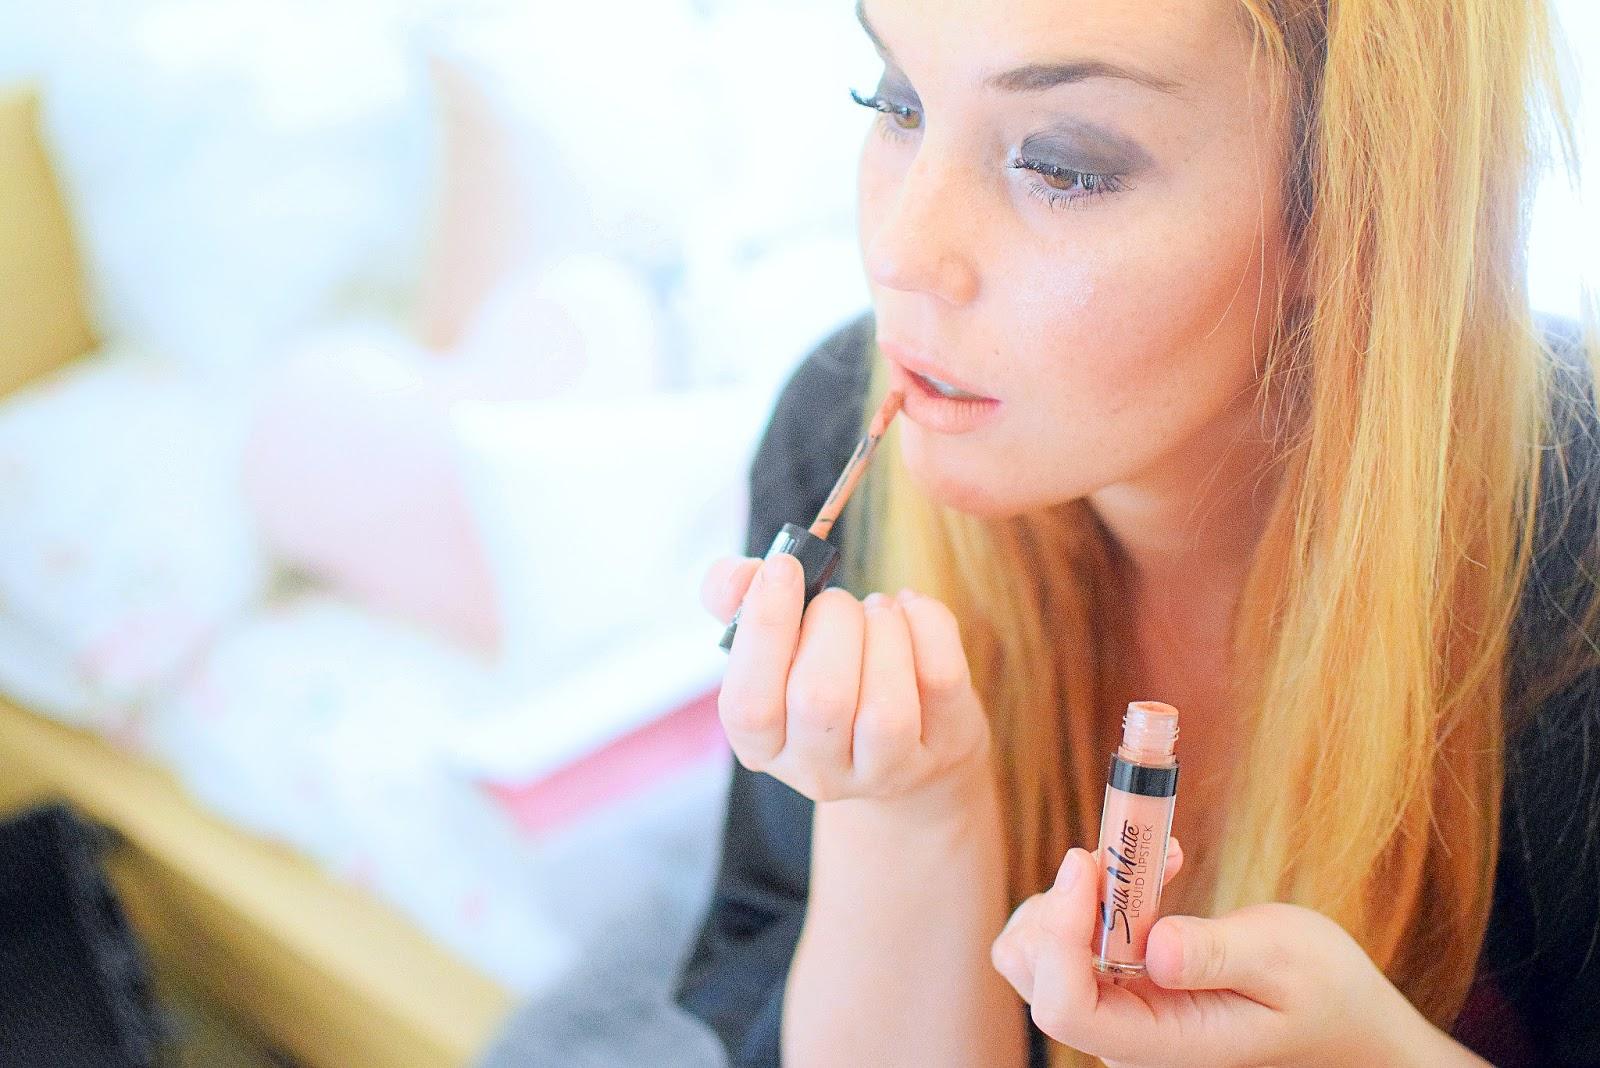 nery hdez, cosméticos, flormar, belleza , beauty blogger, maquillaje flormar